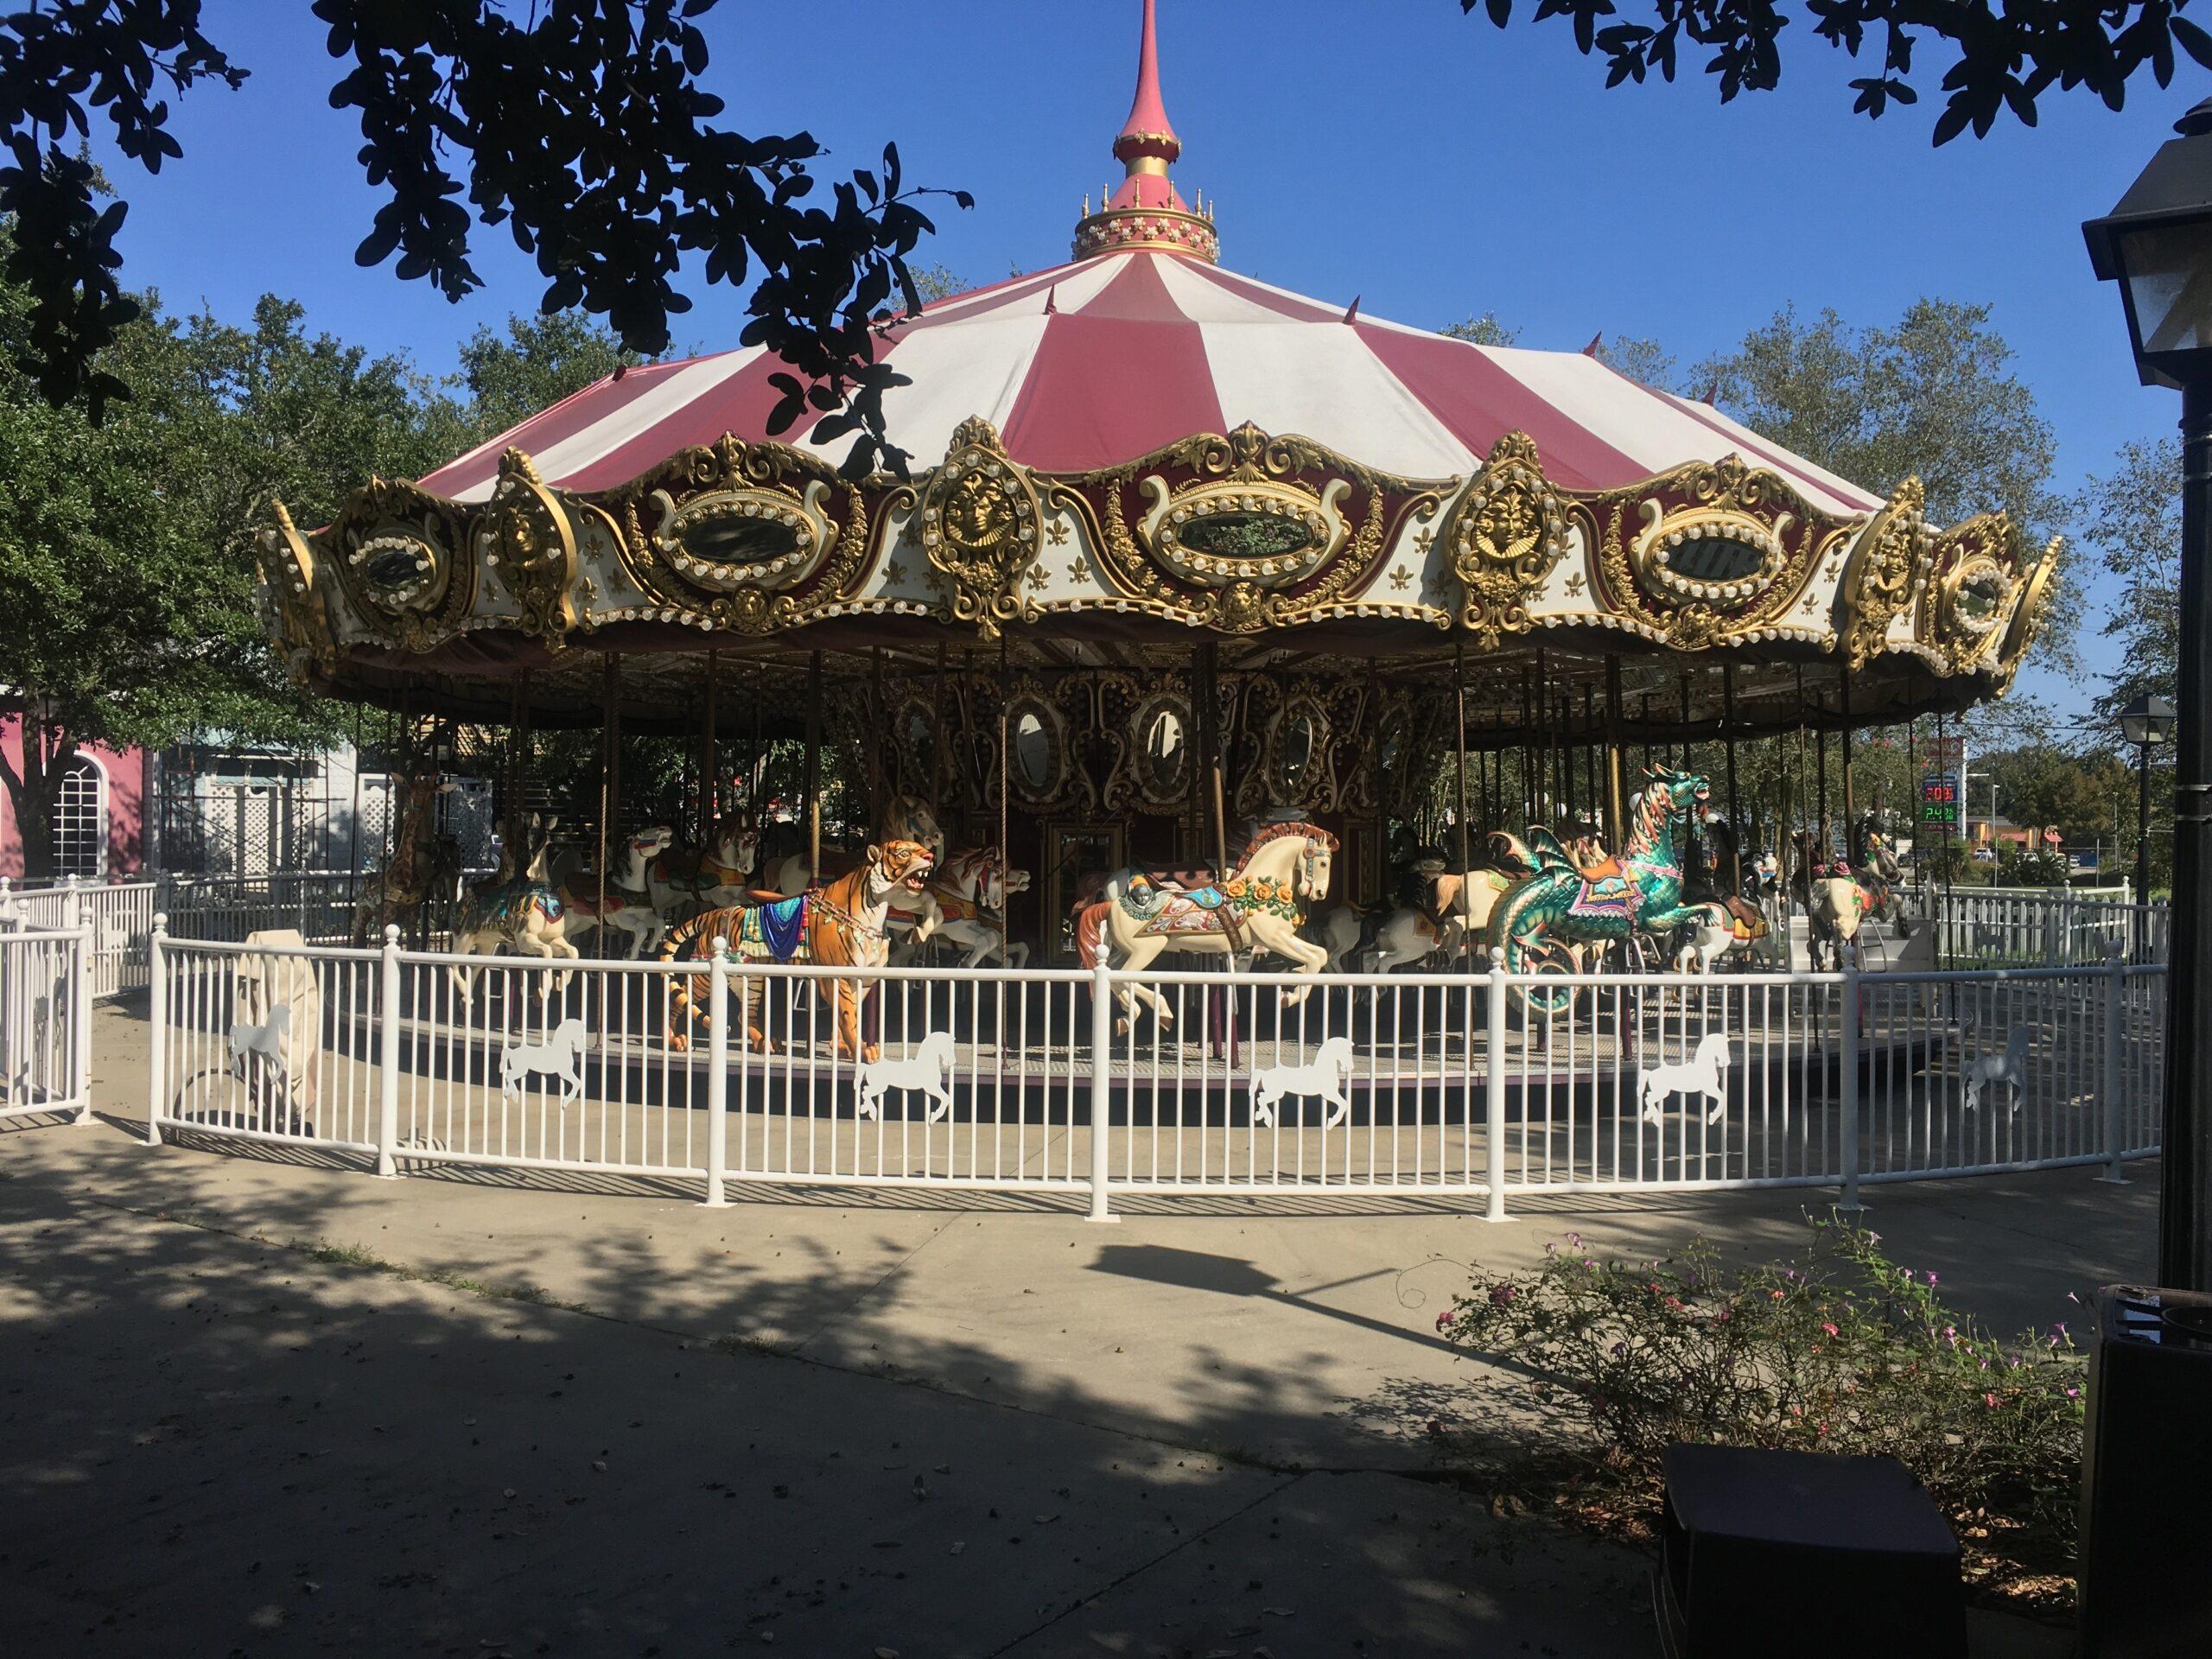 Chance Rides Carousel